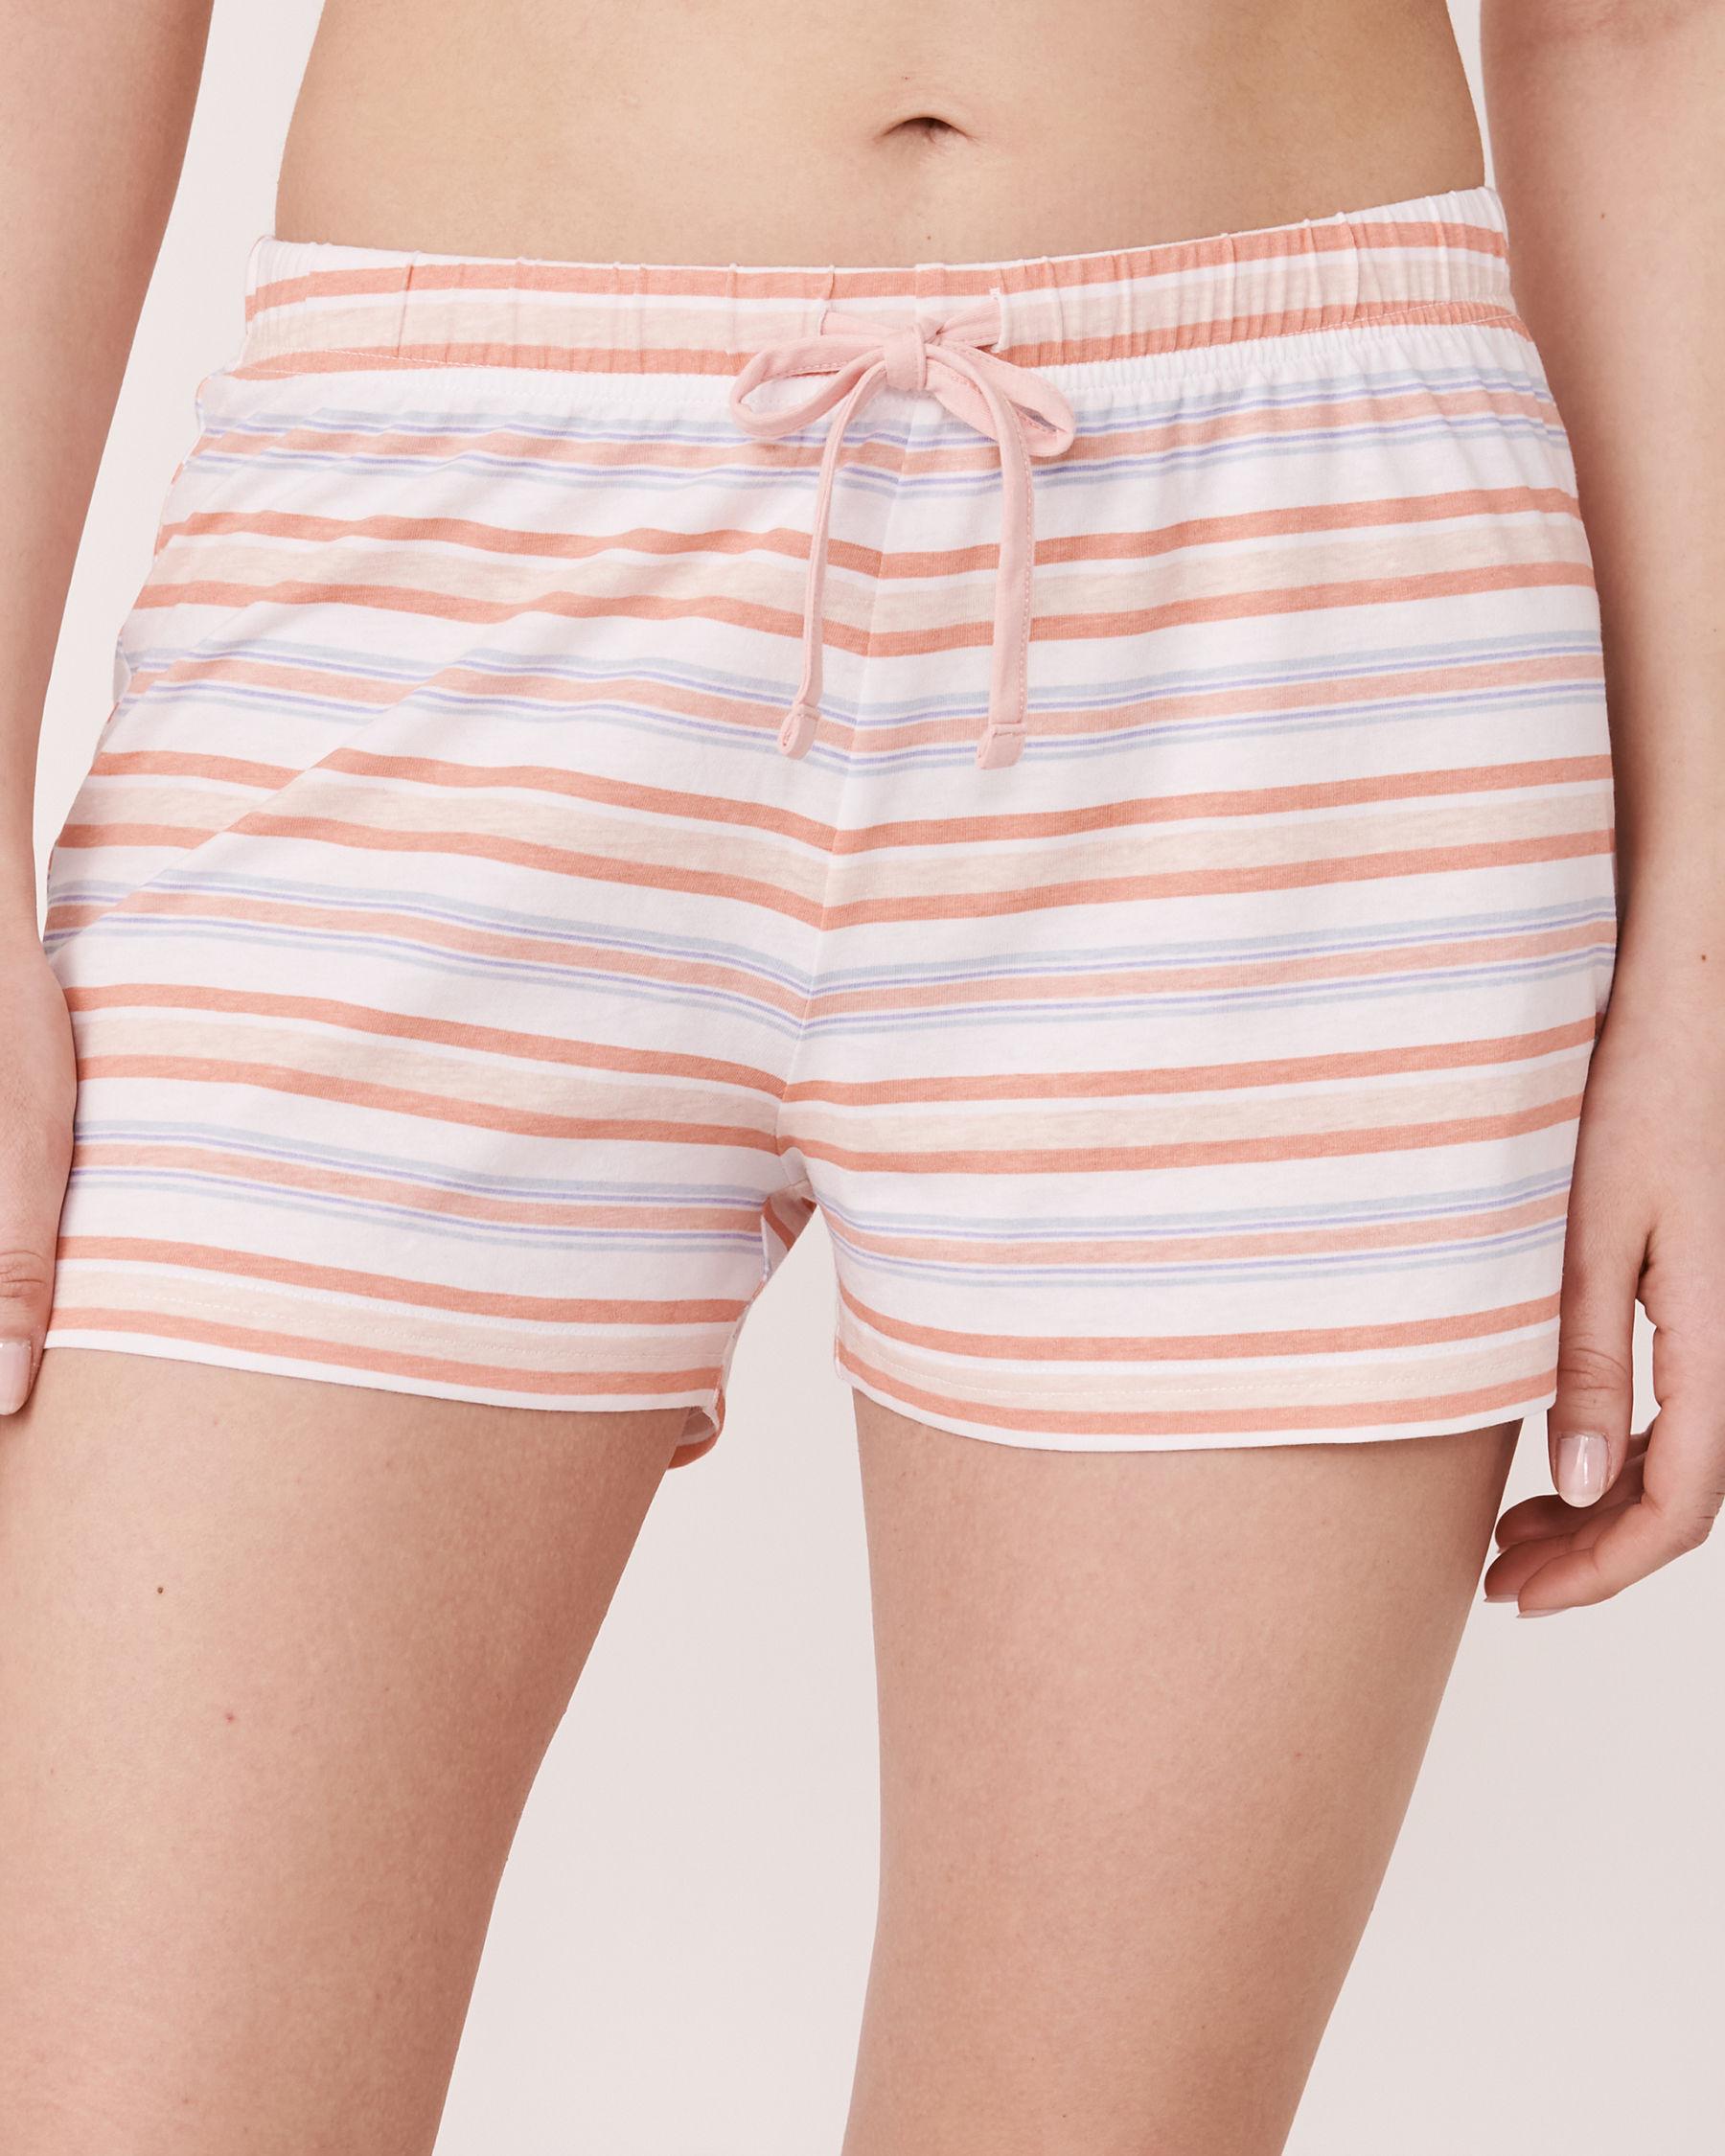 LA VIE EN ROSE Short de pyjama bande de taille élastique Rayures multicolores 40200039 - Voir1